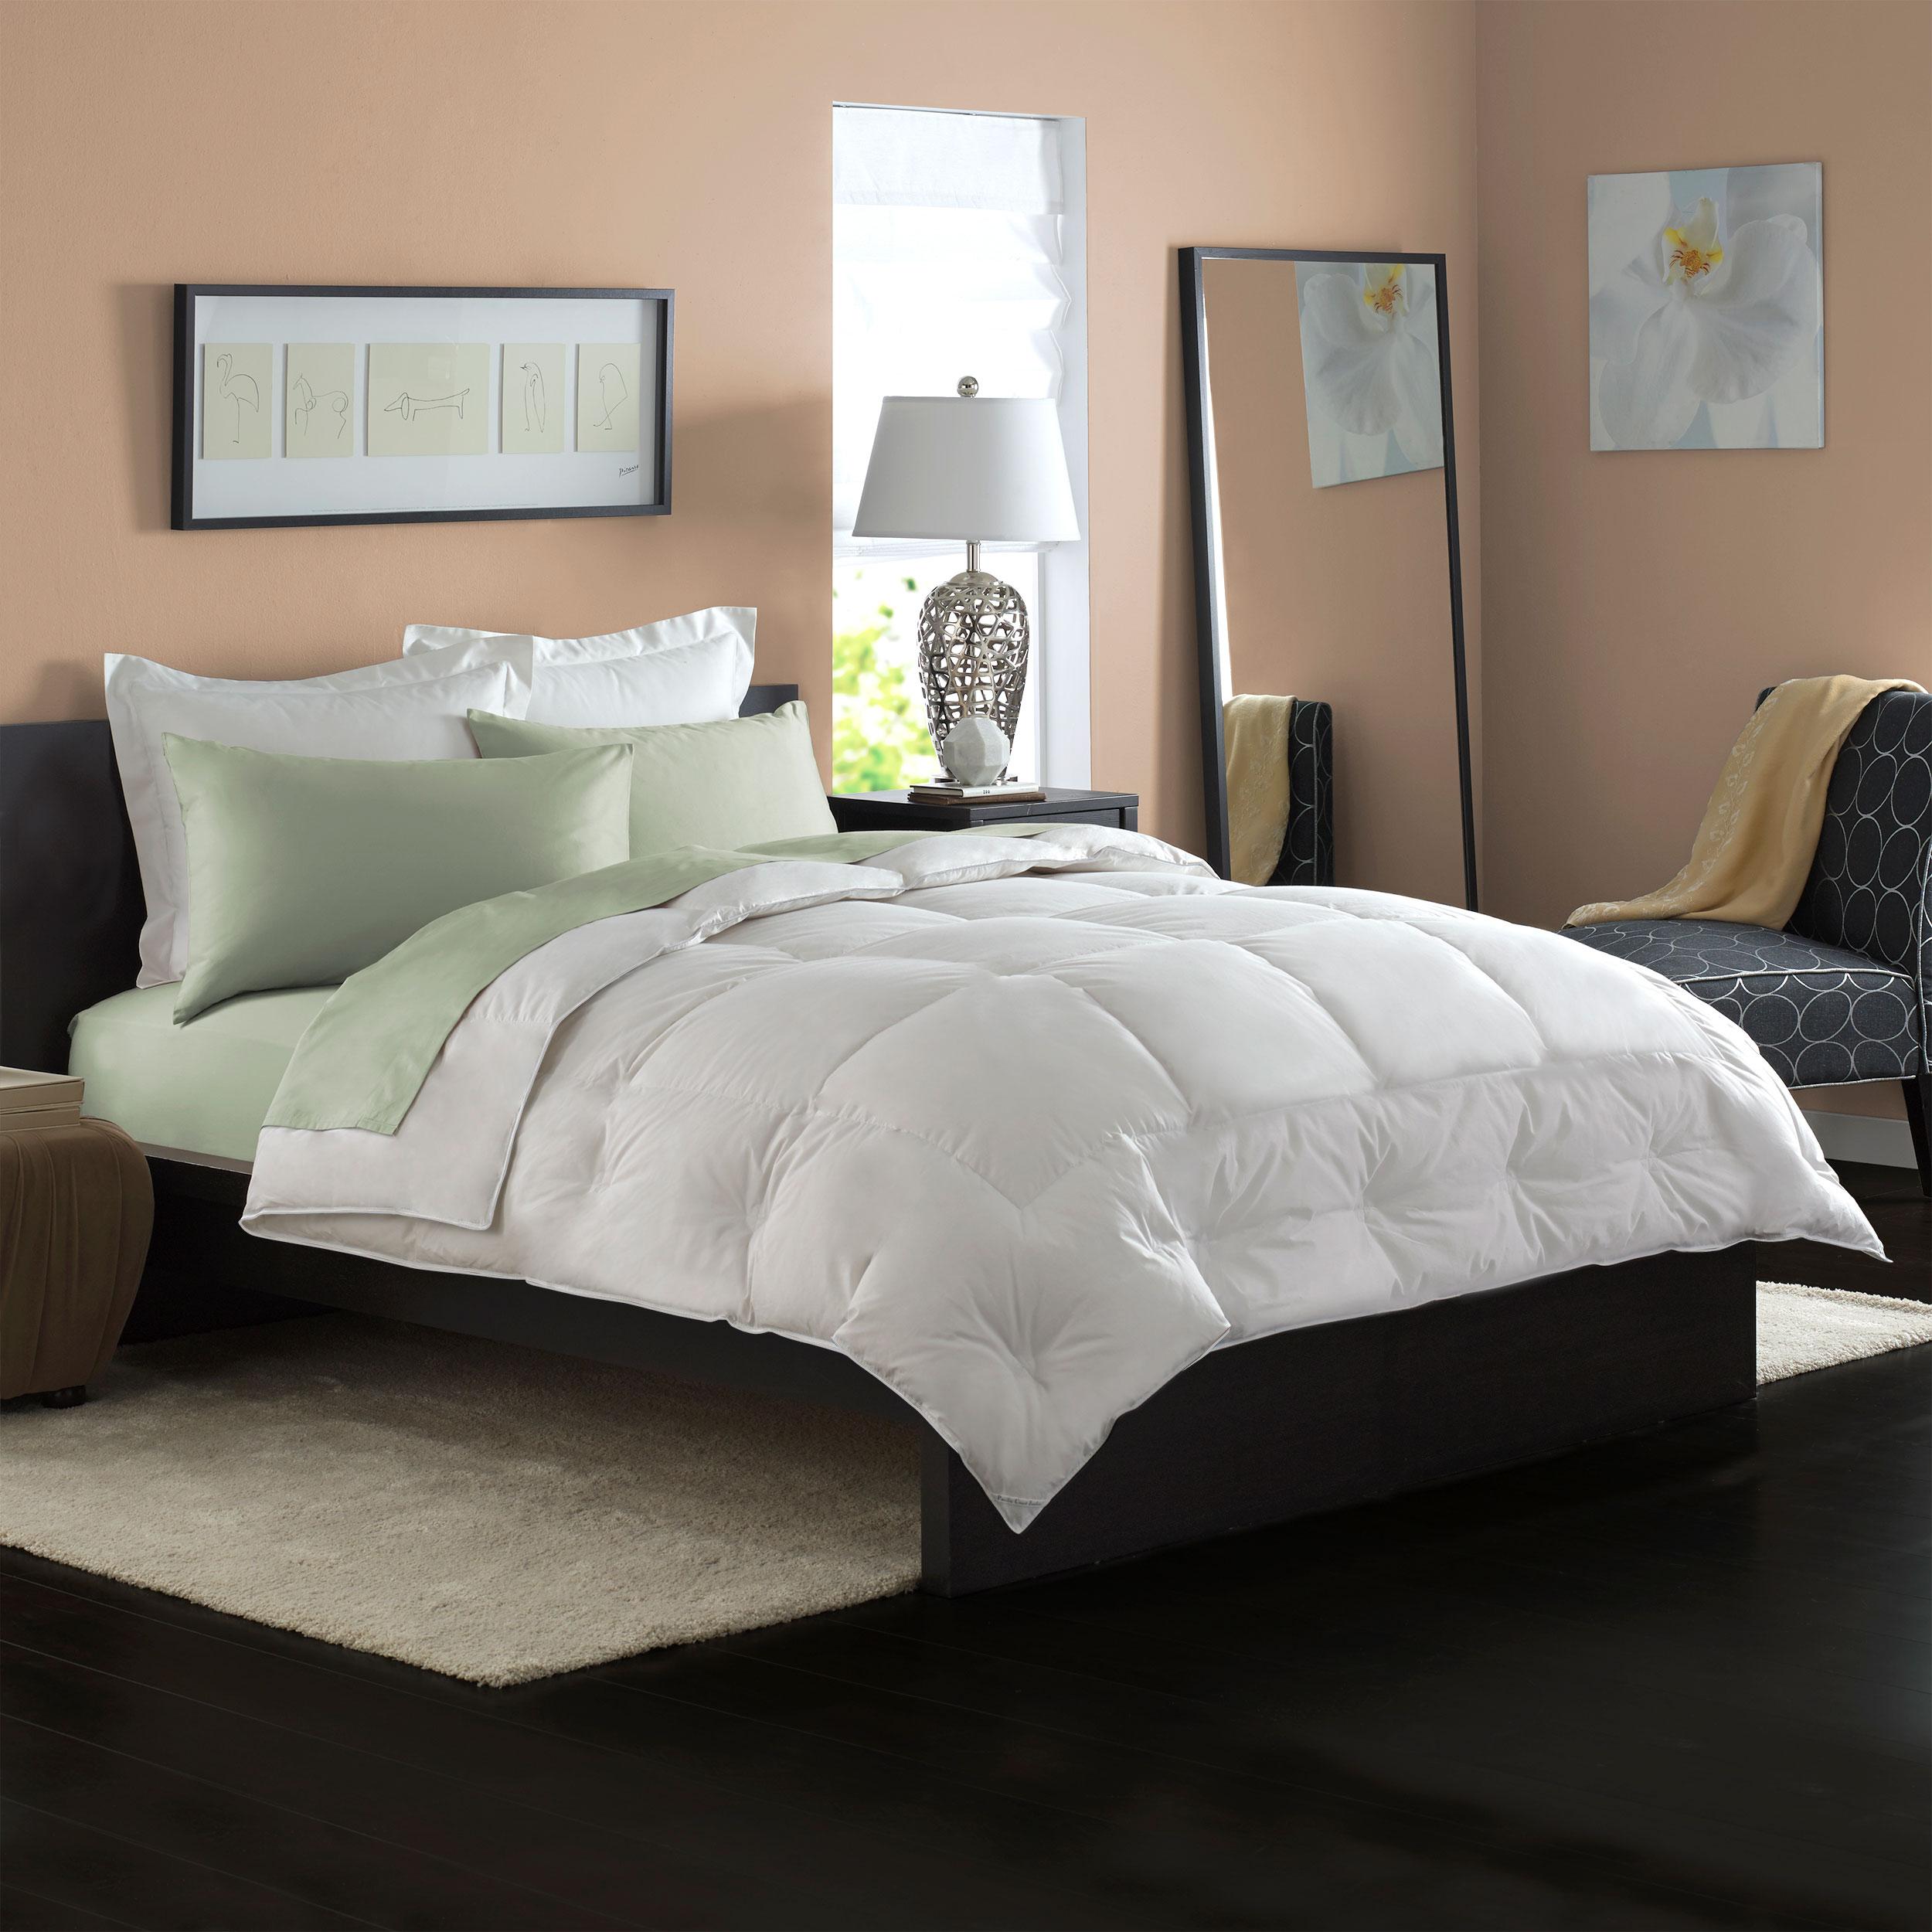 The Allergy Comforter Pacific Coast Bedding